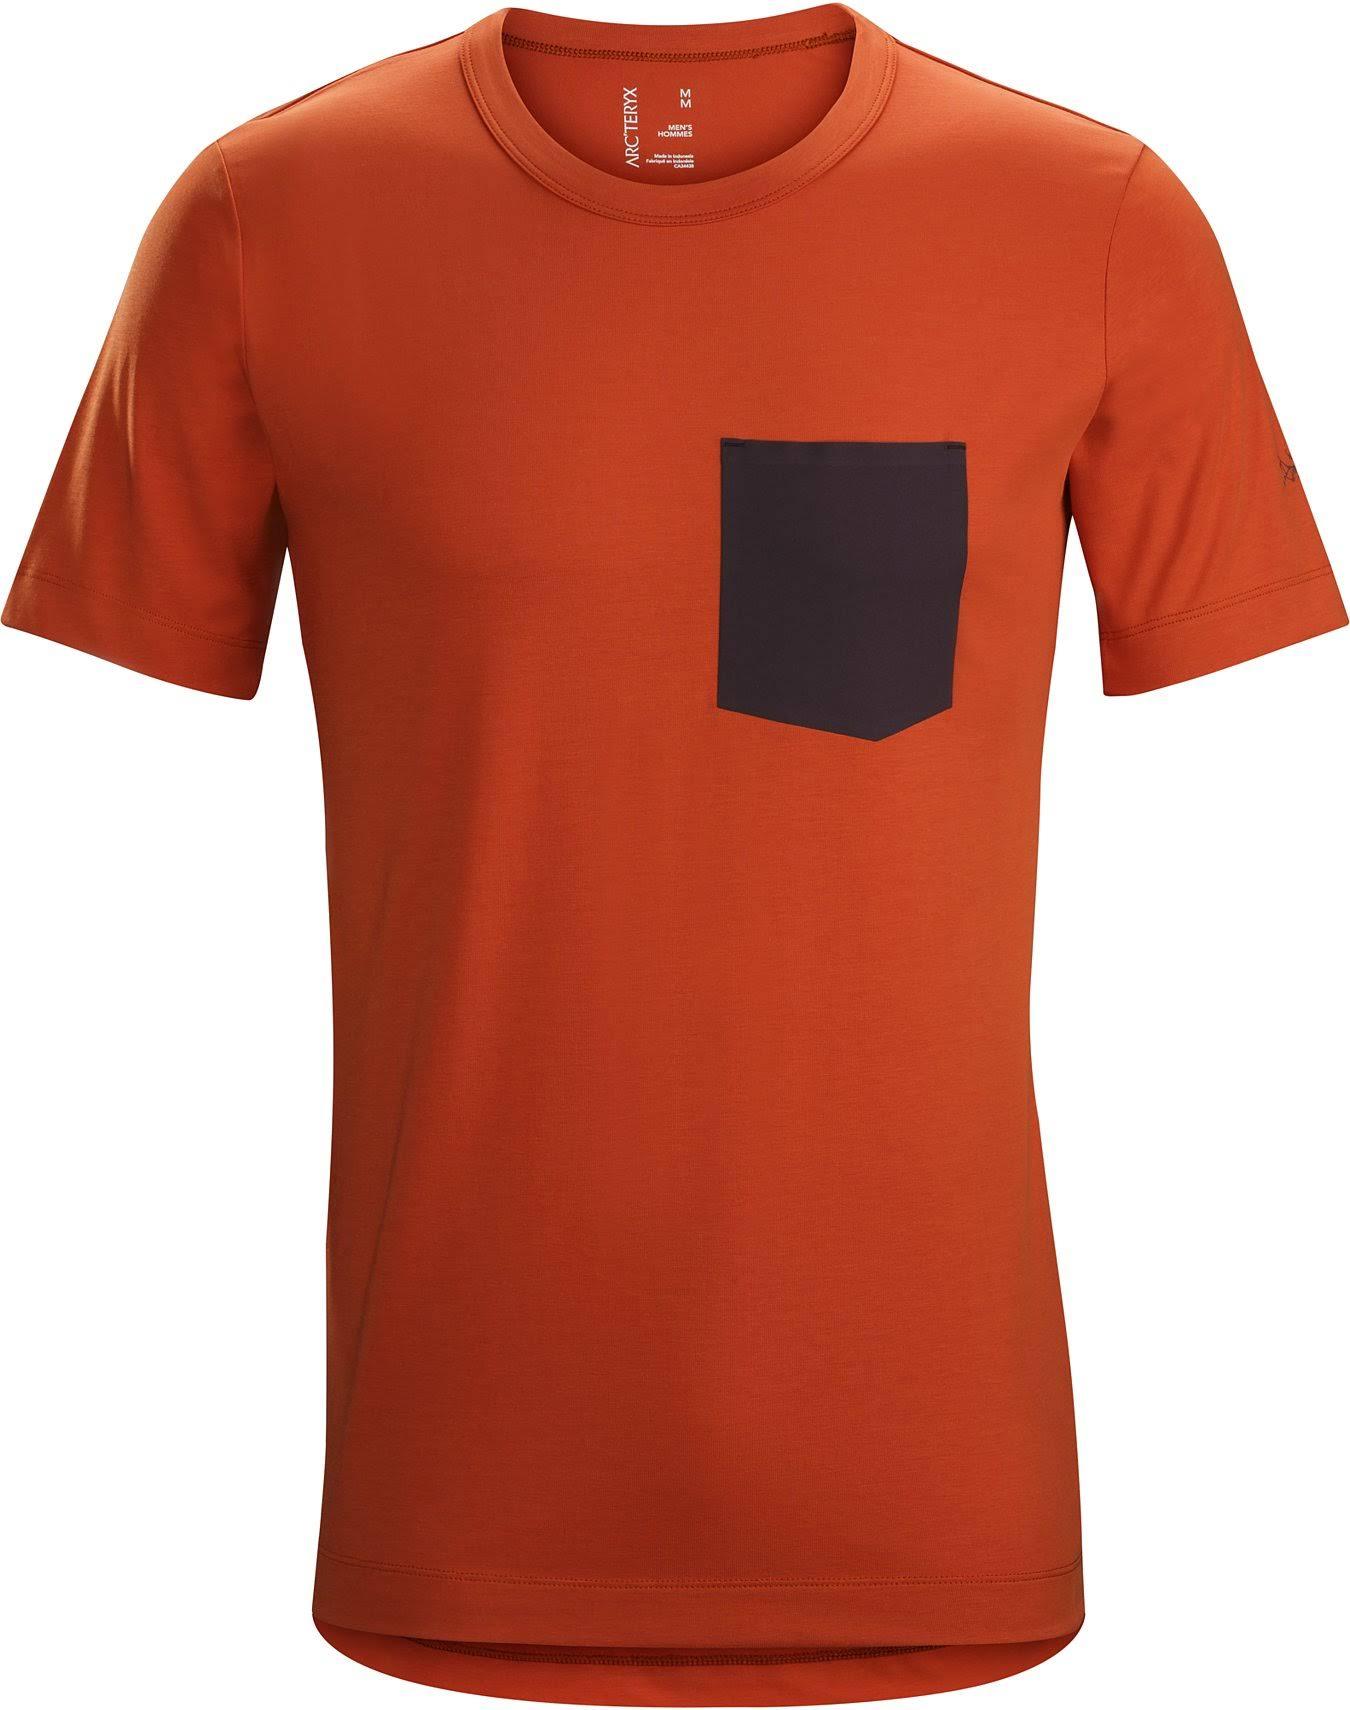 Hombre Rooibos Anzo Camiseta Grande Para Arczox qxBnwP6